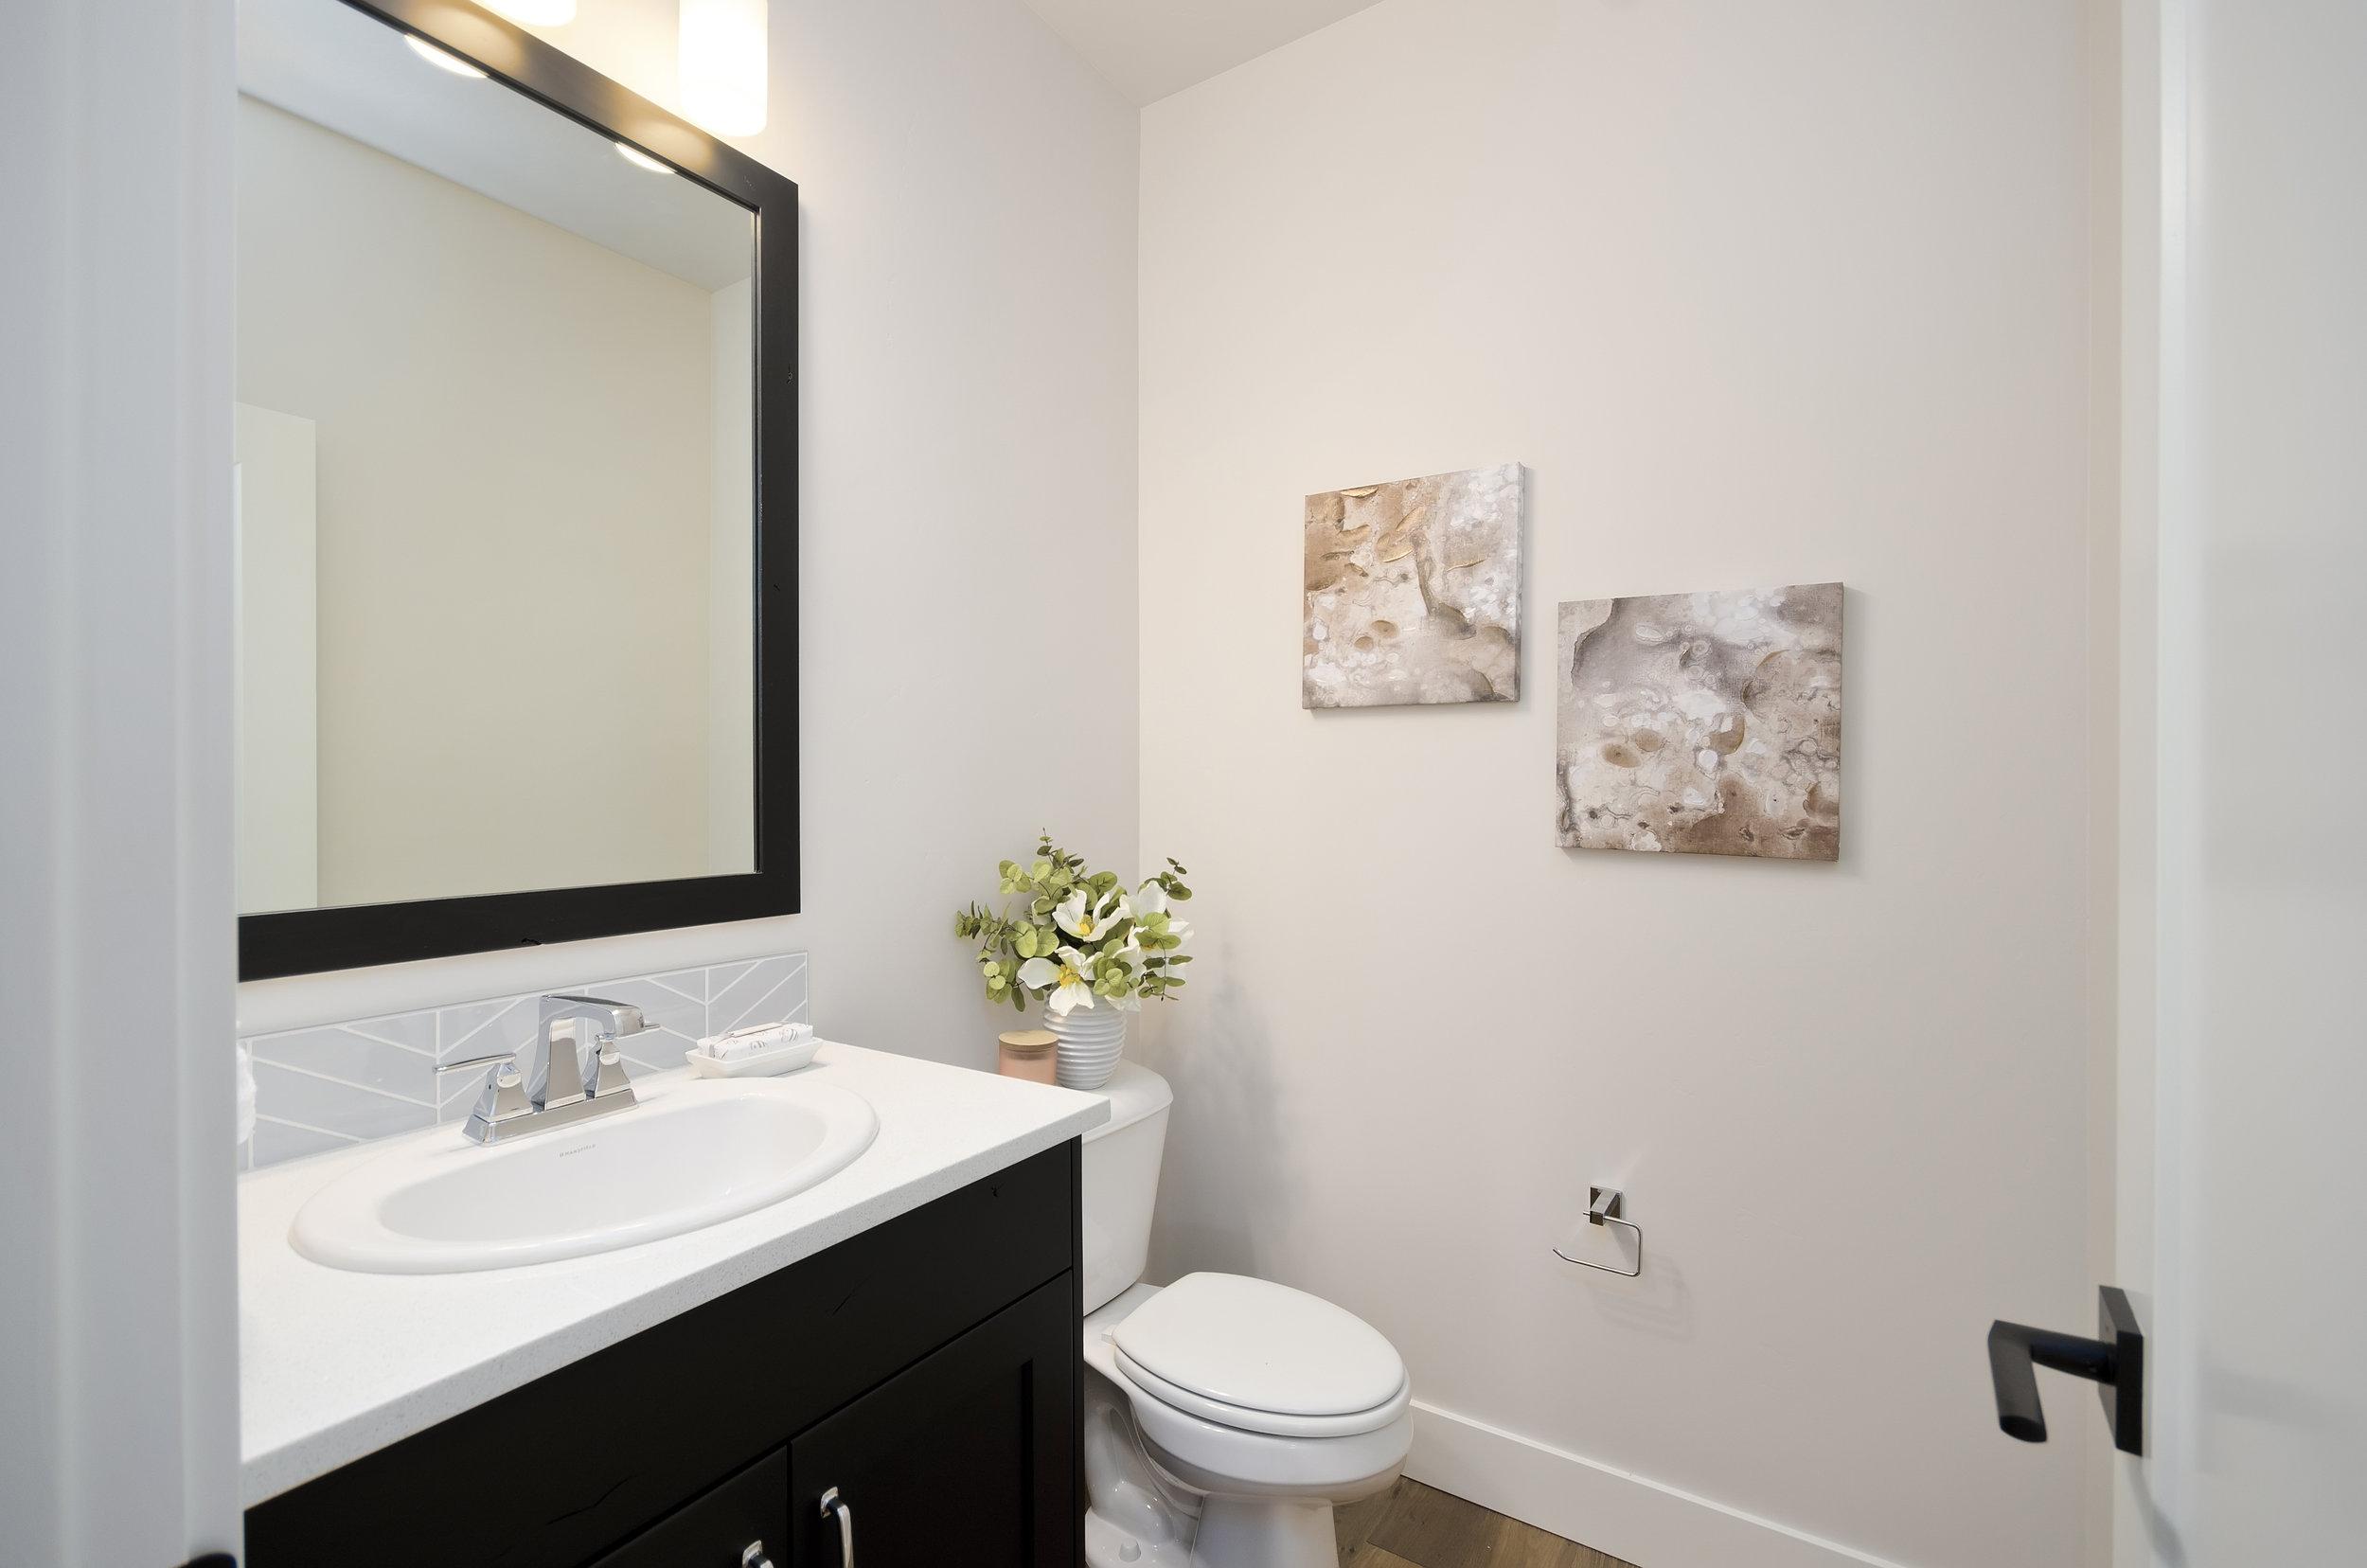 07-Bathroom.jpg